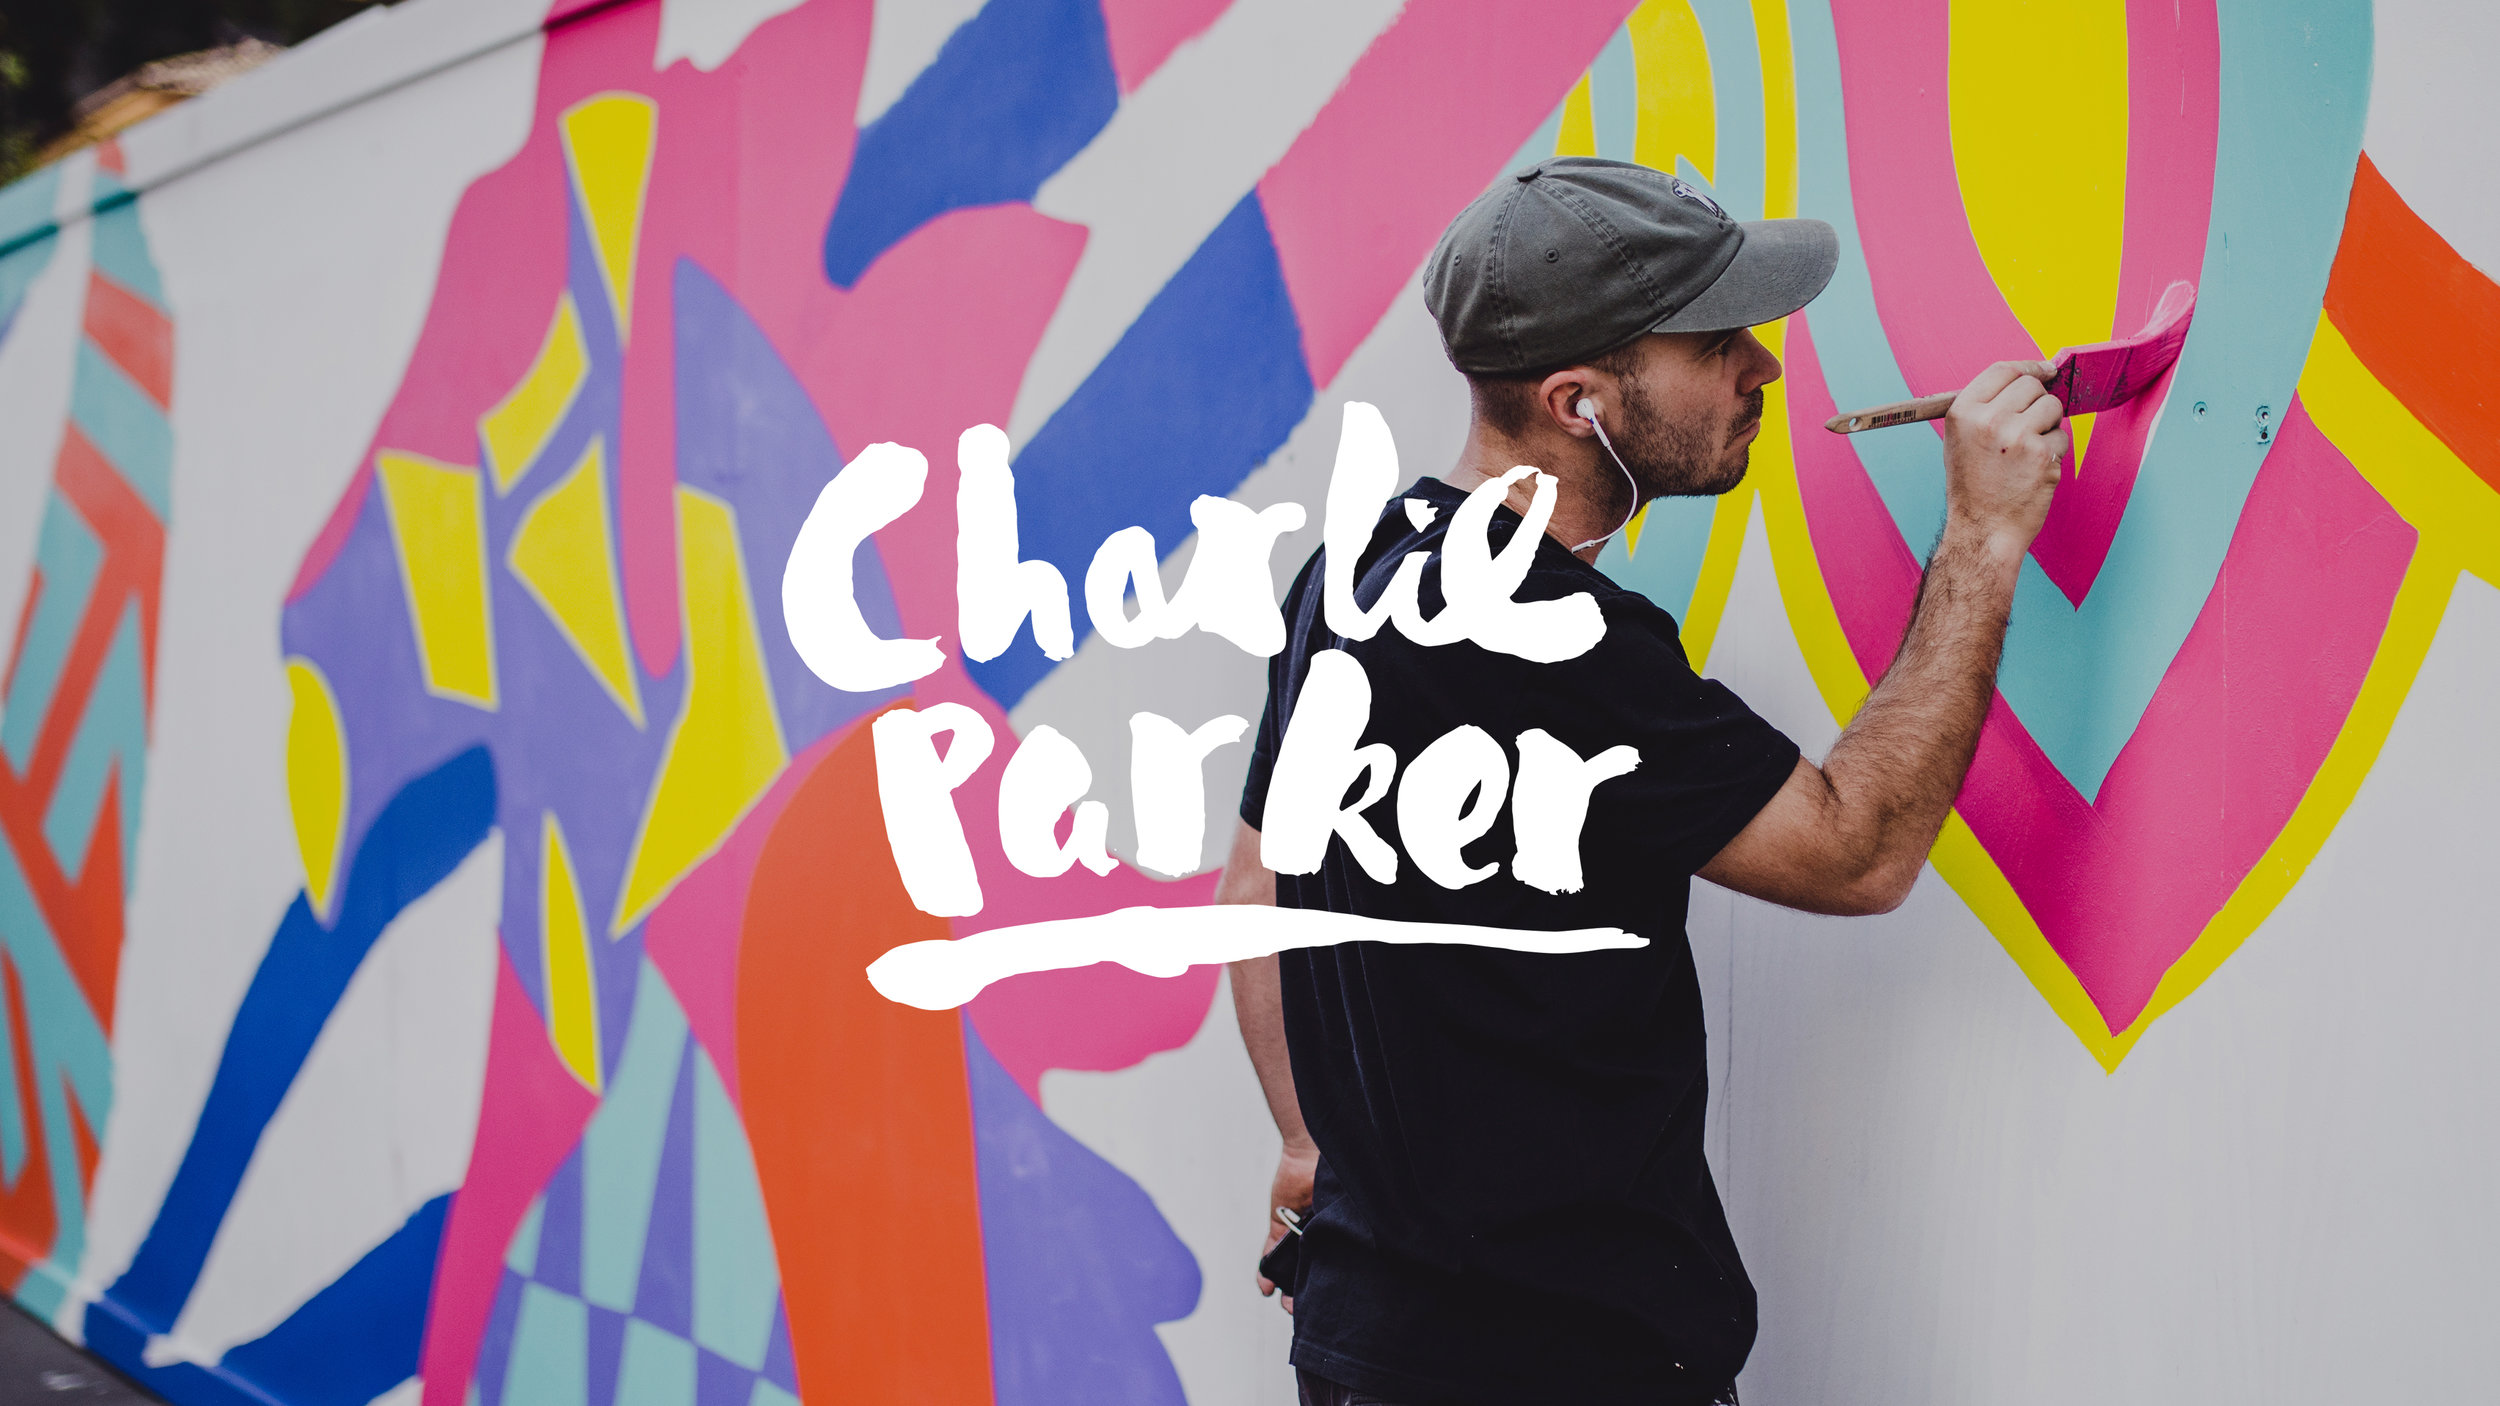 Charlie_parker_Coronation_Property_brand_identity_2018.jpg